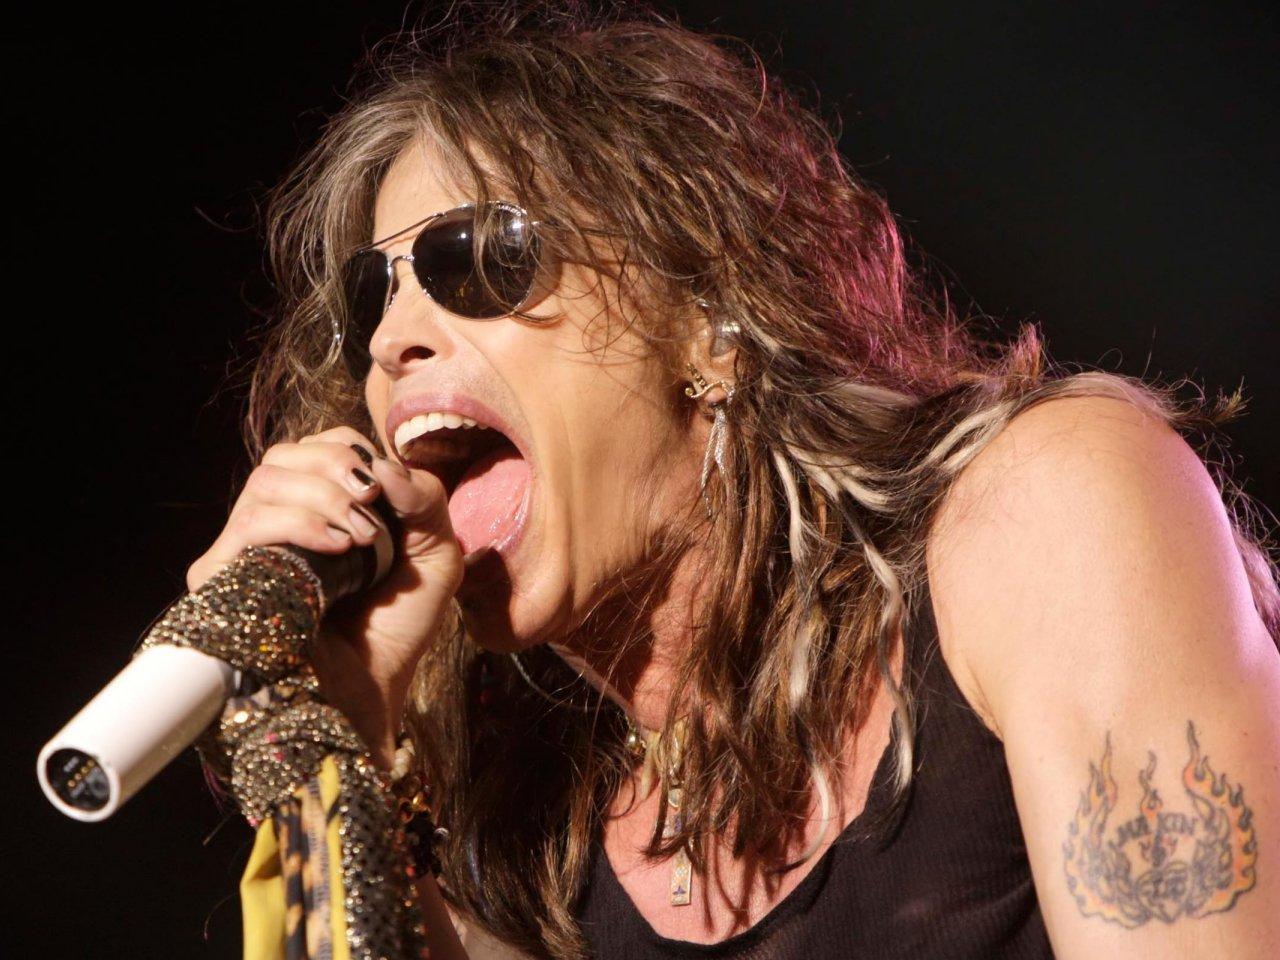 Aerosmith-005 live in concert steven tyler rare promo photo live janies got a gun concert performance